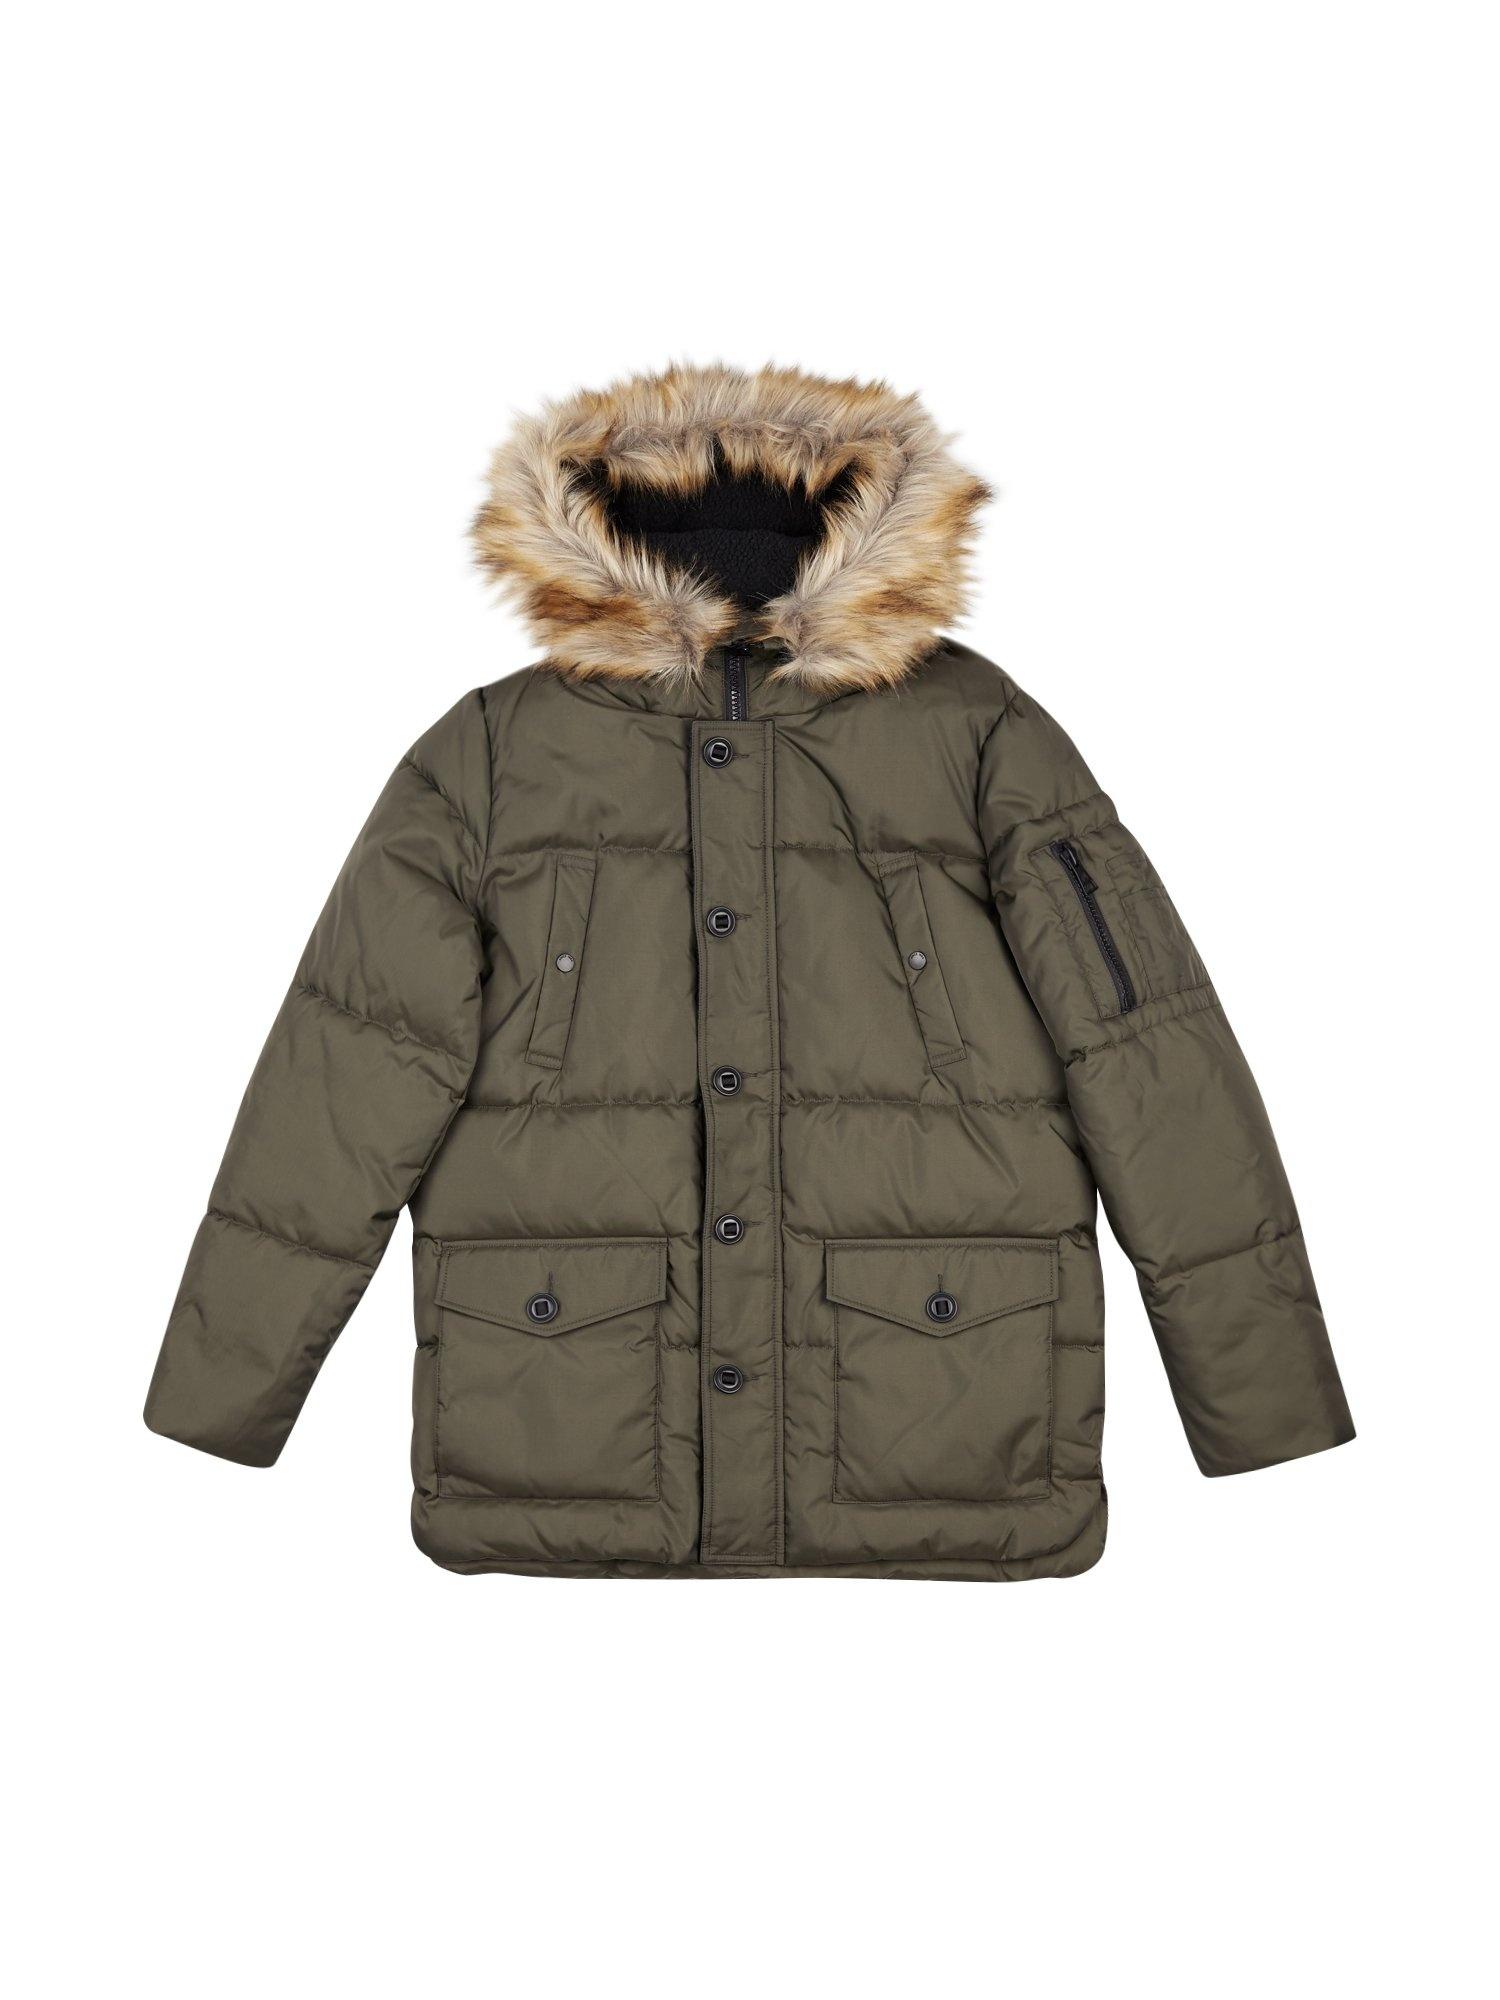 Khaki Faux Fur Hooded Smart Parka Jacket £35 Burton